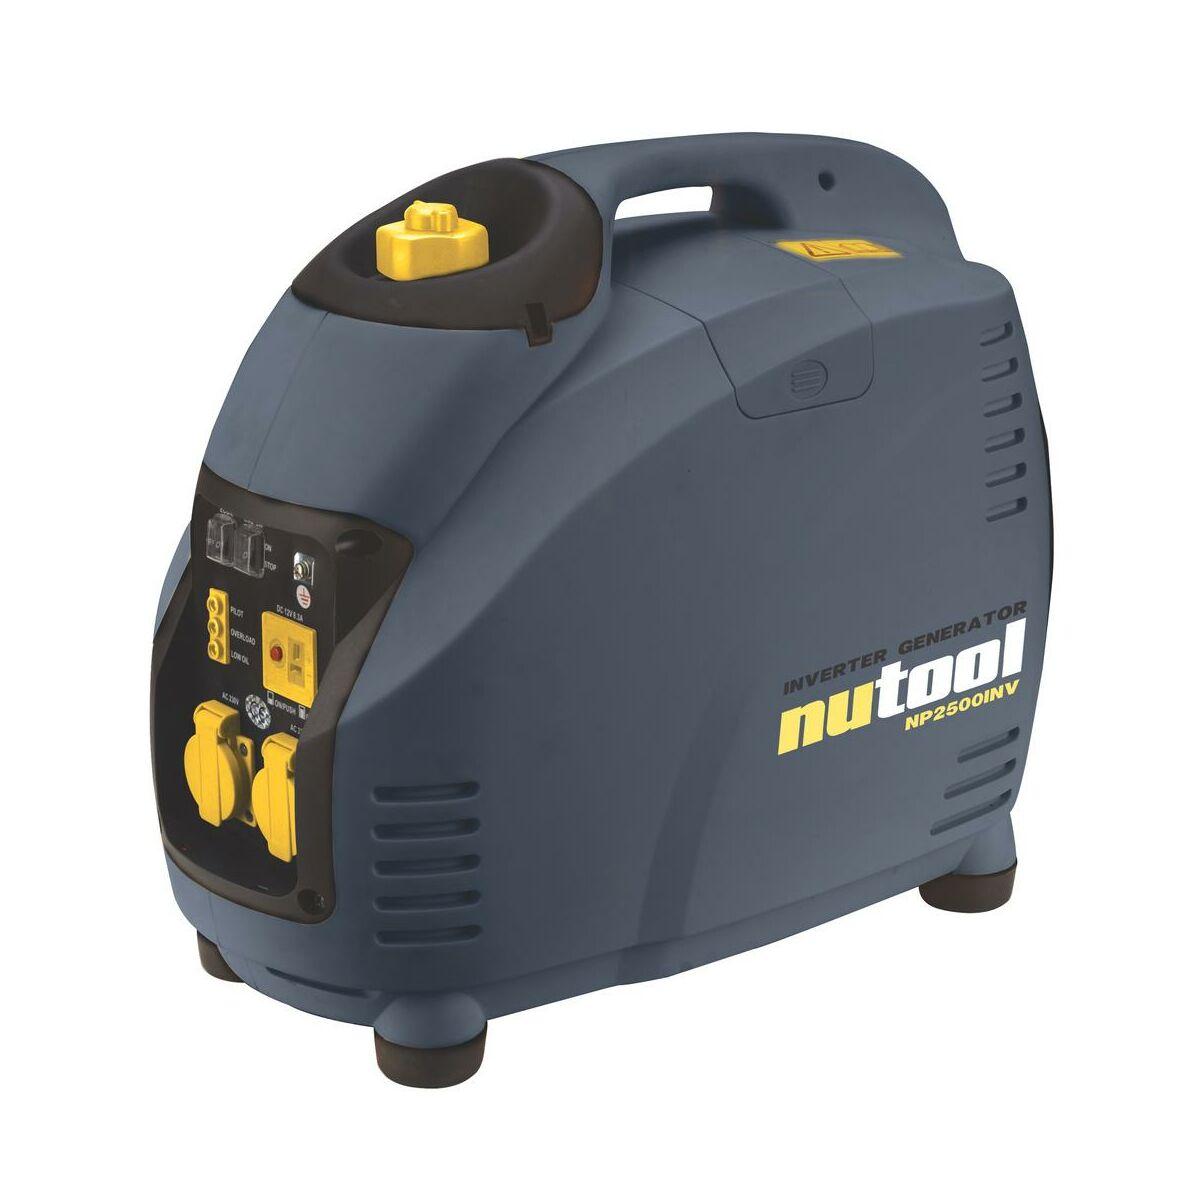 Generator pr dotw rczy inwertorowy np2500inv nutool for Leroy merlin generatore